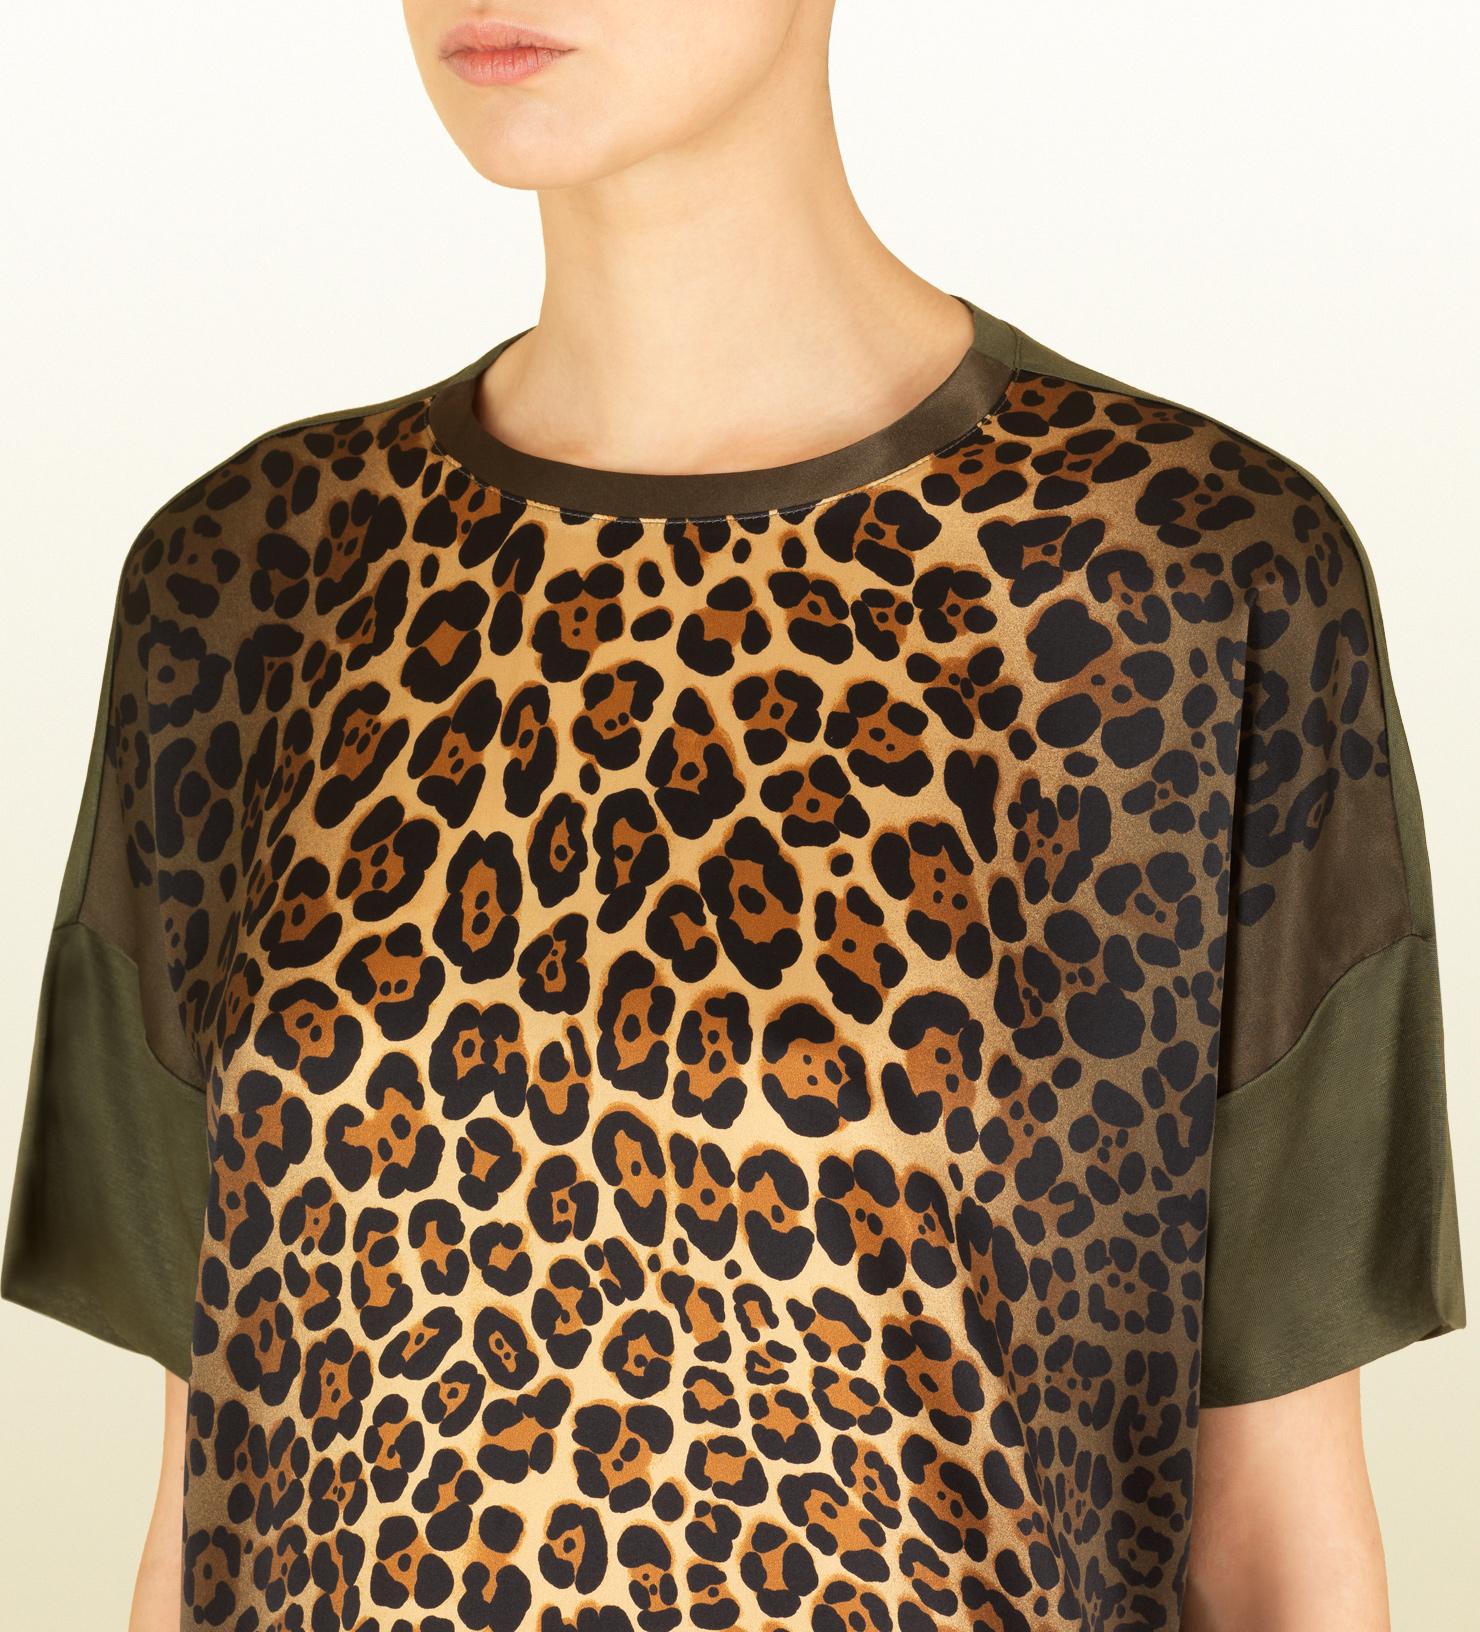 mufflebox t up shirts unisex outline product grey mock shirt type jaguar f